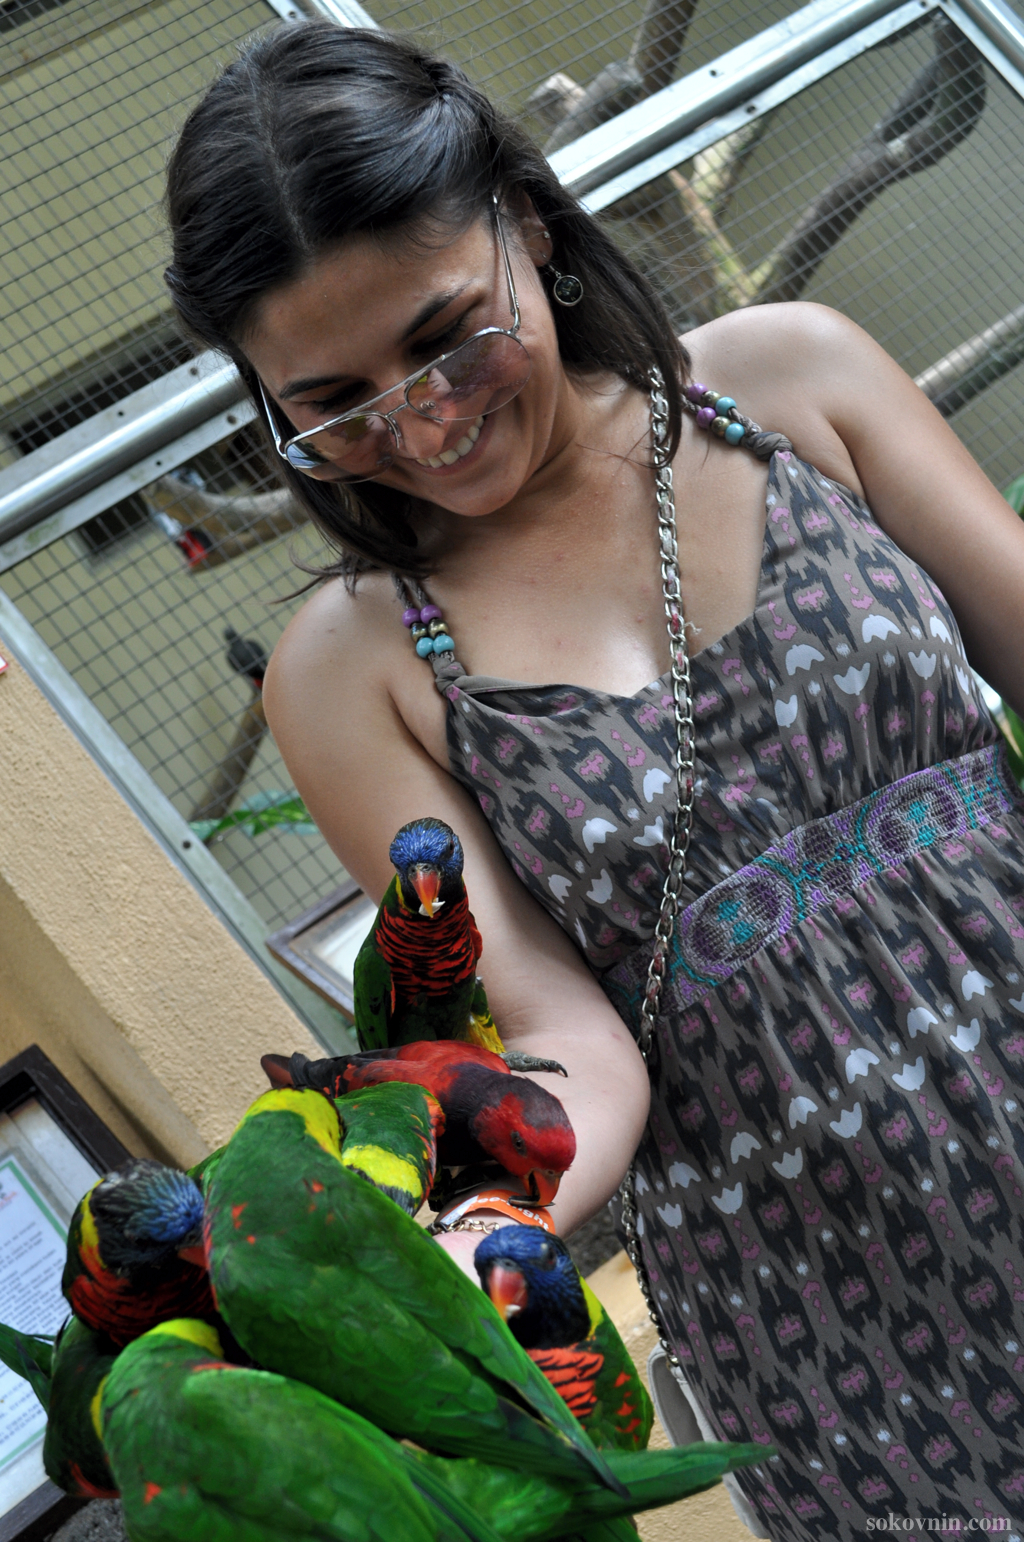 Попугаи садятся на руки и голову